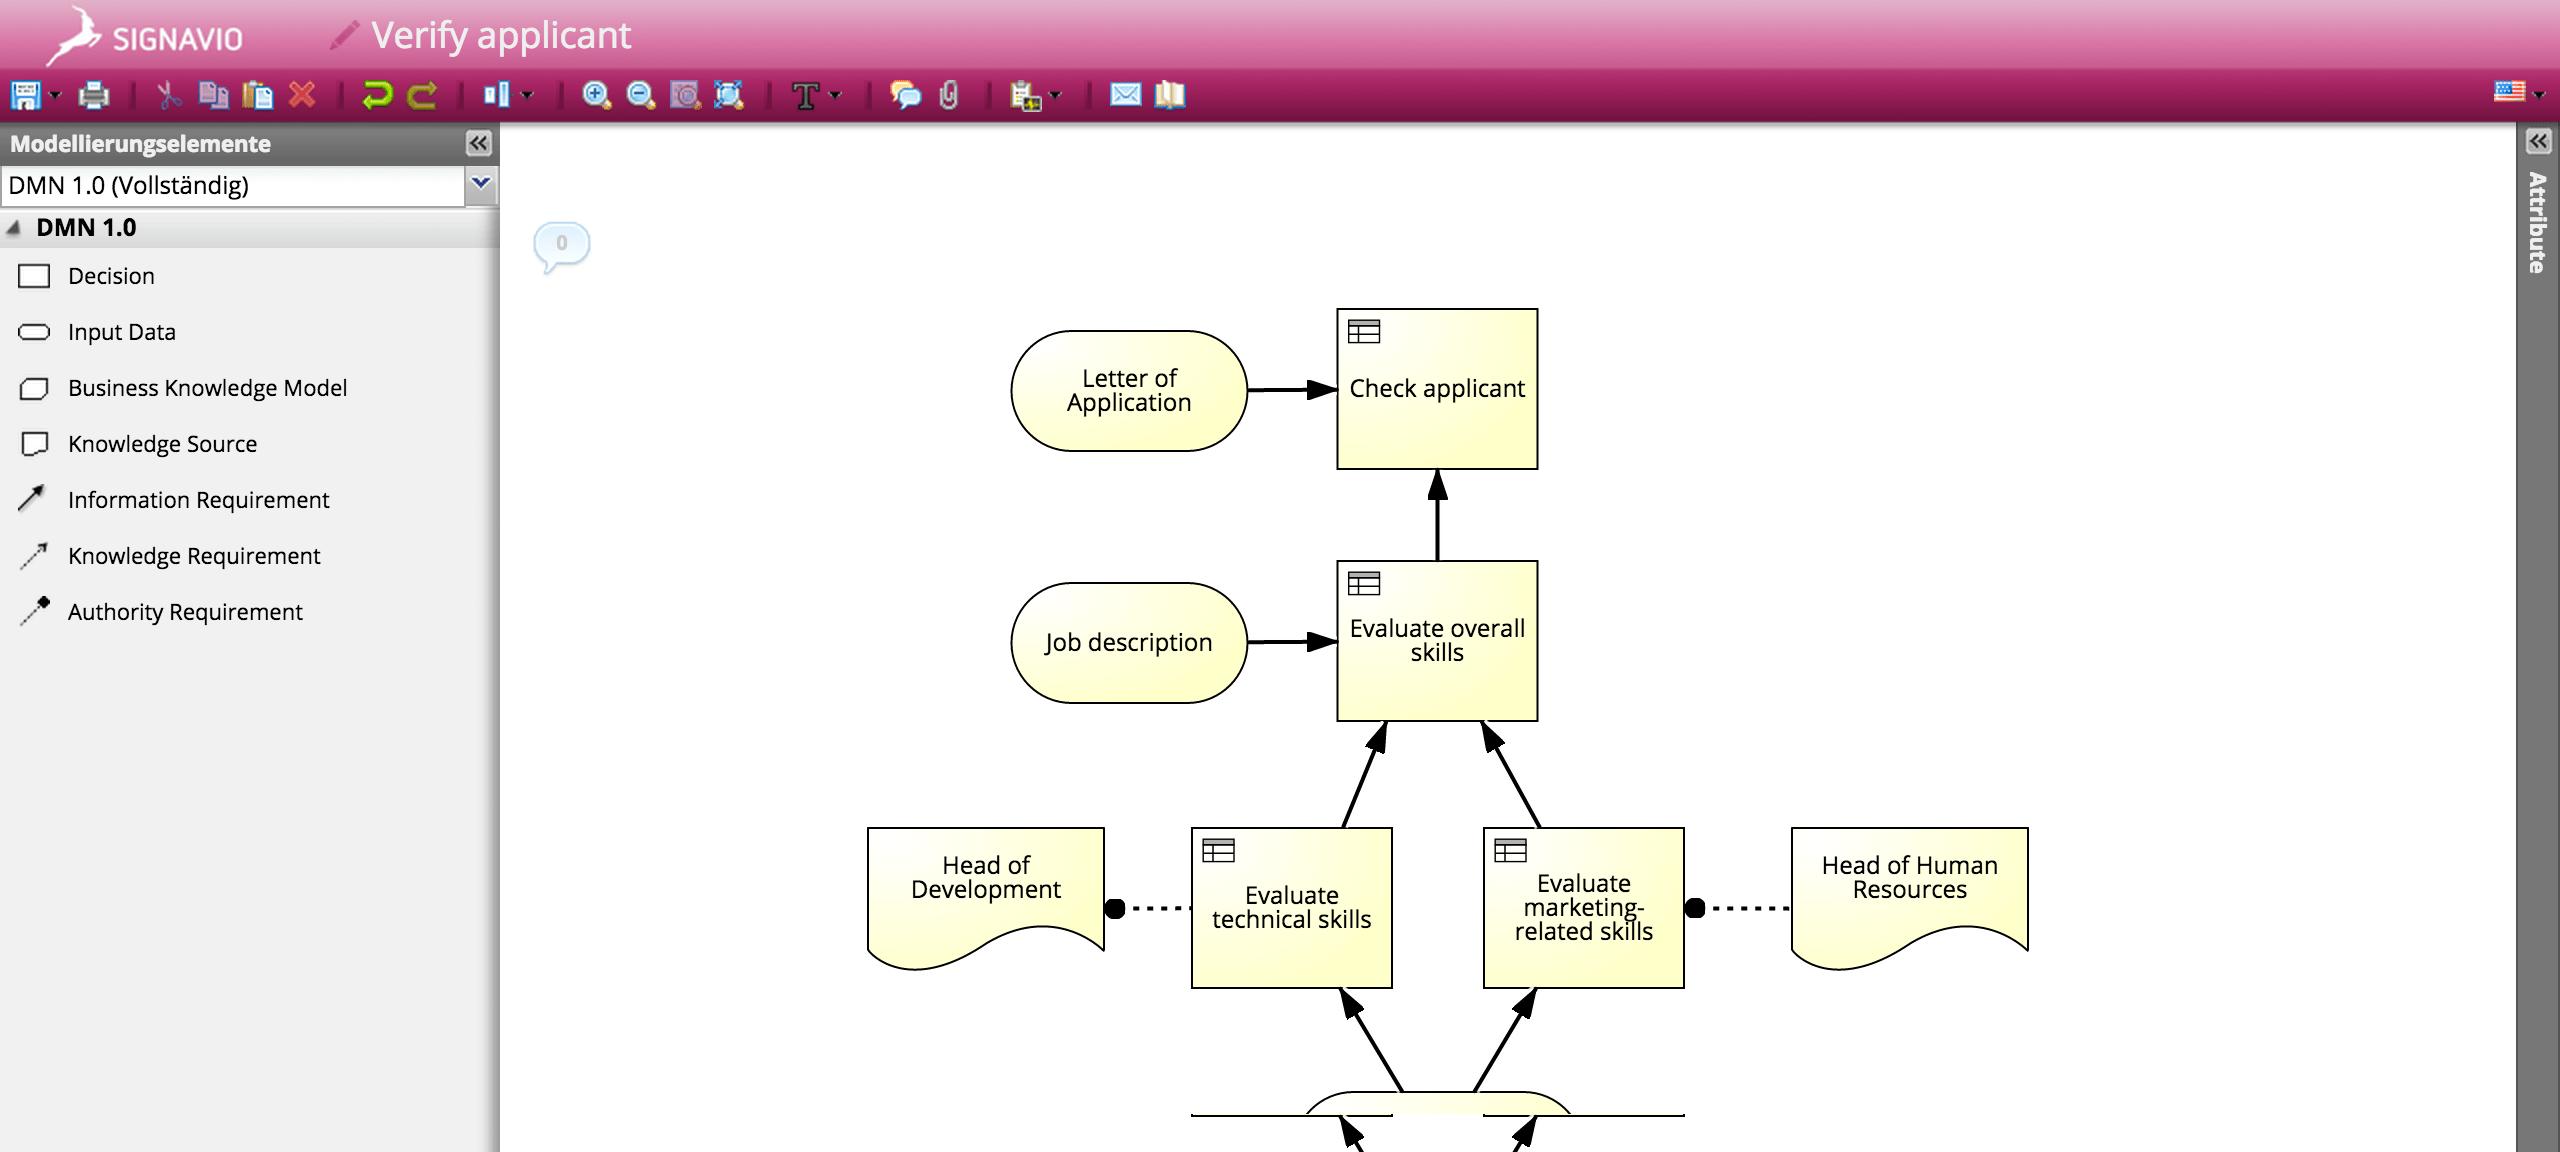 DMN Requirements Diagrams (DRD) -Signavio Process Manager- Screenshot